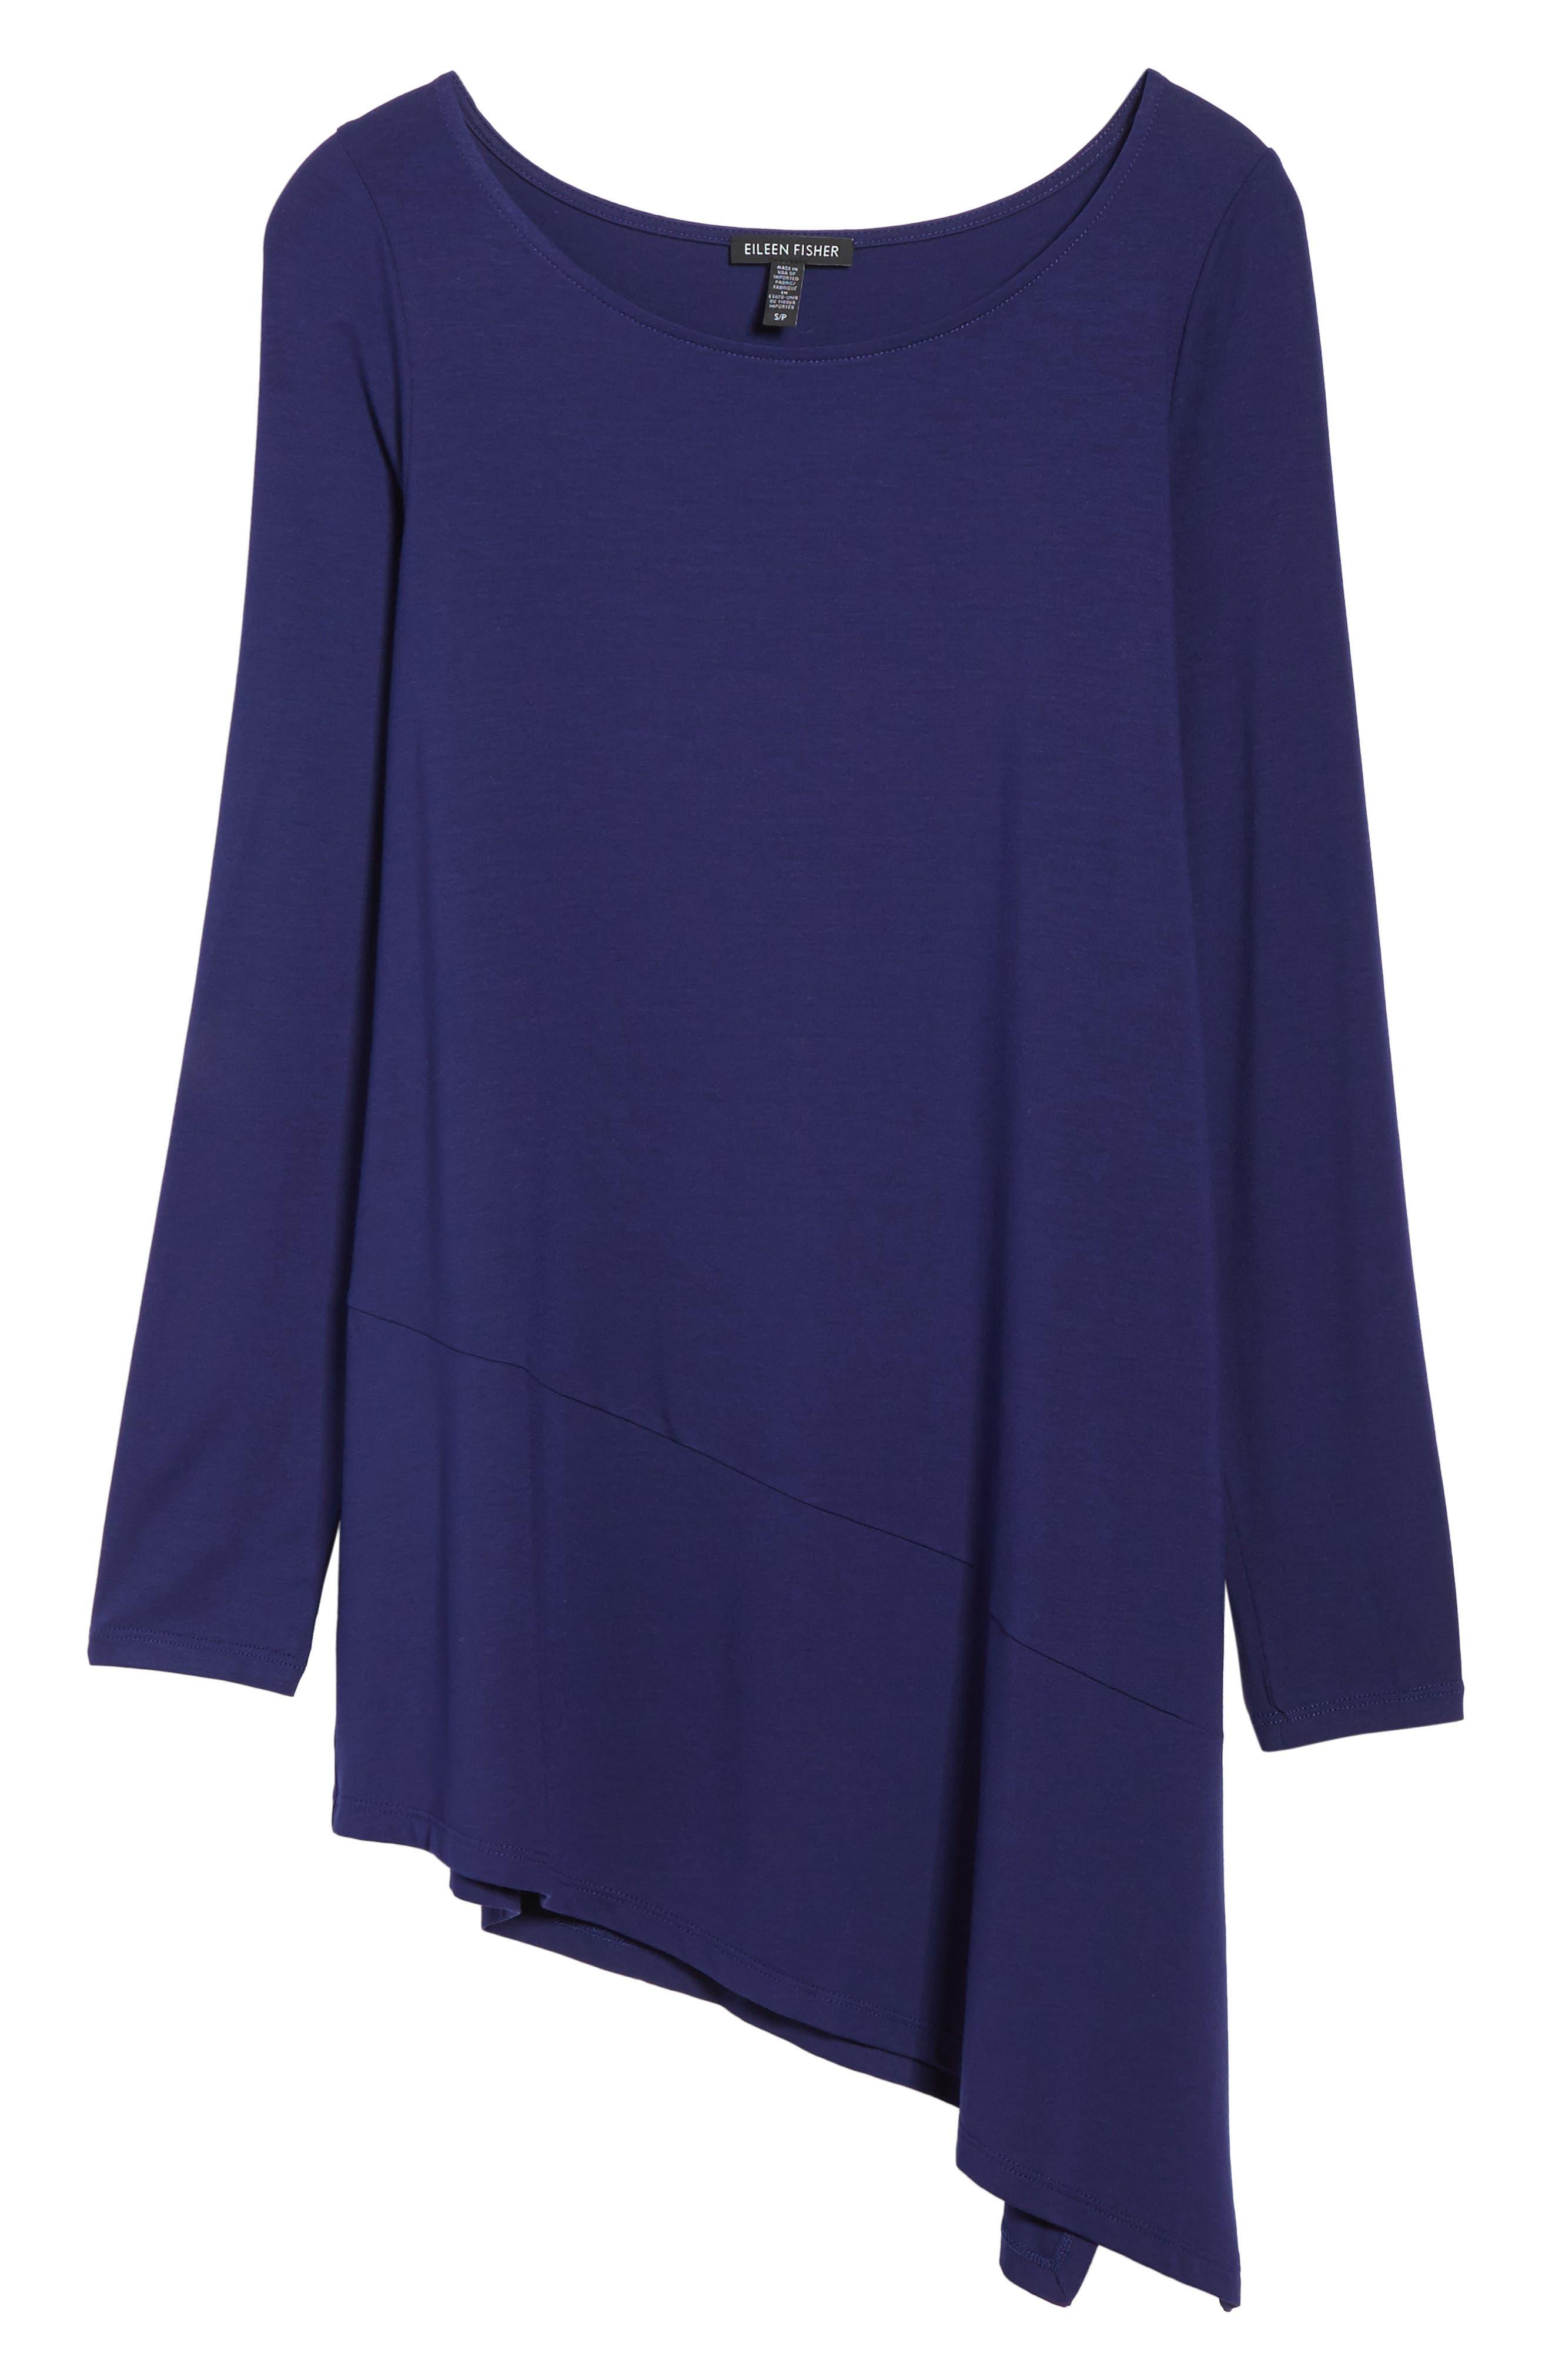 Main Image - Eileen Fisher Bateau Neck Asymmetrical Jersey Tunic (Regular & Petite) (Online Only)